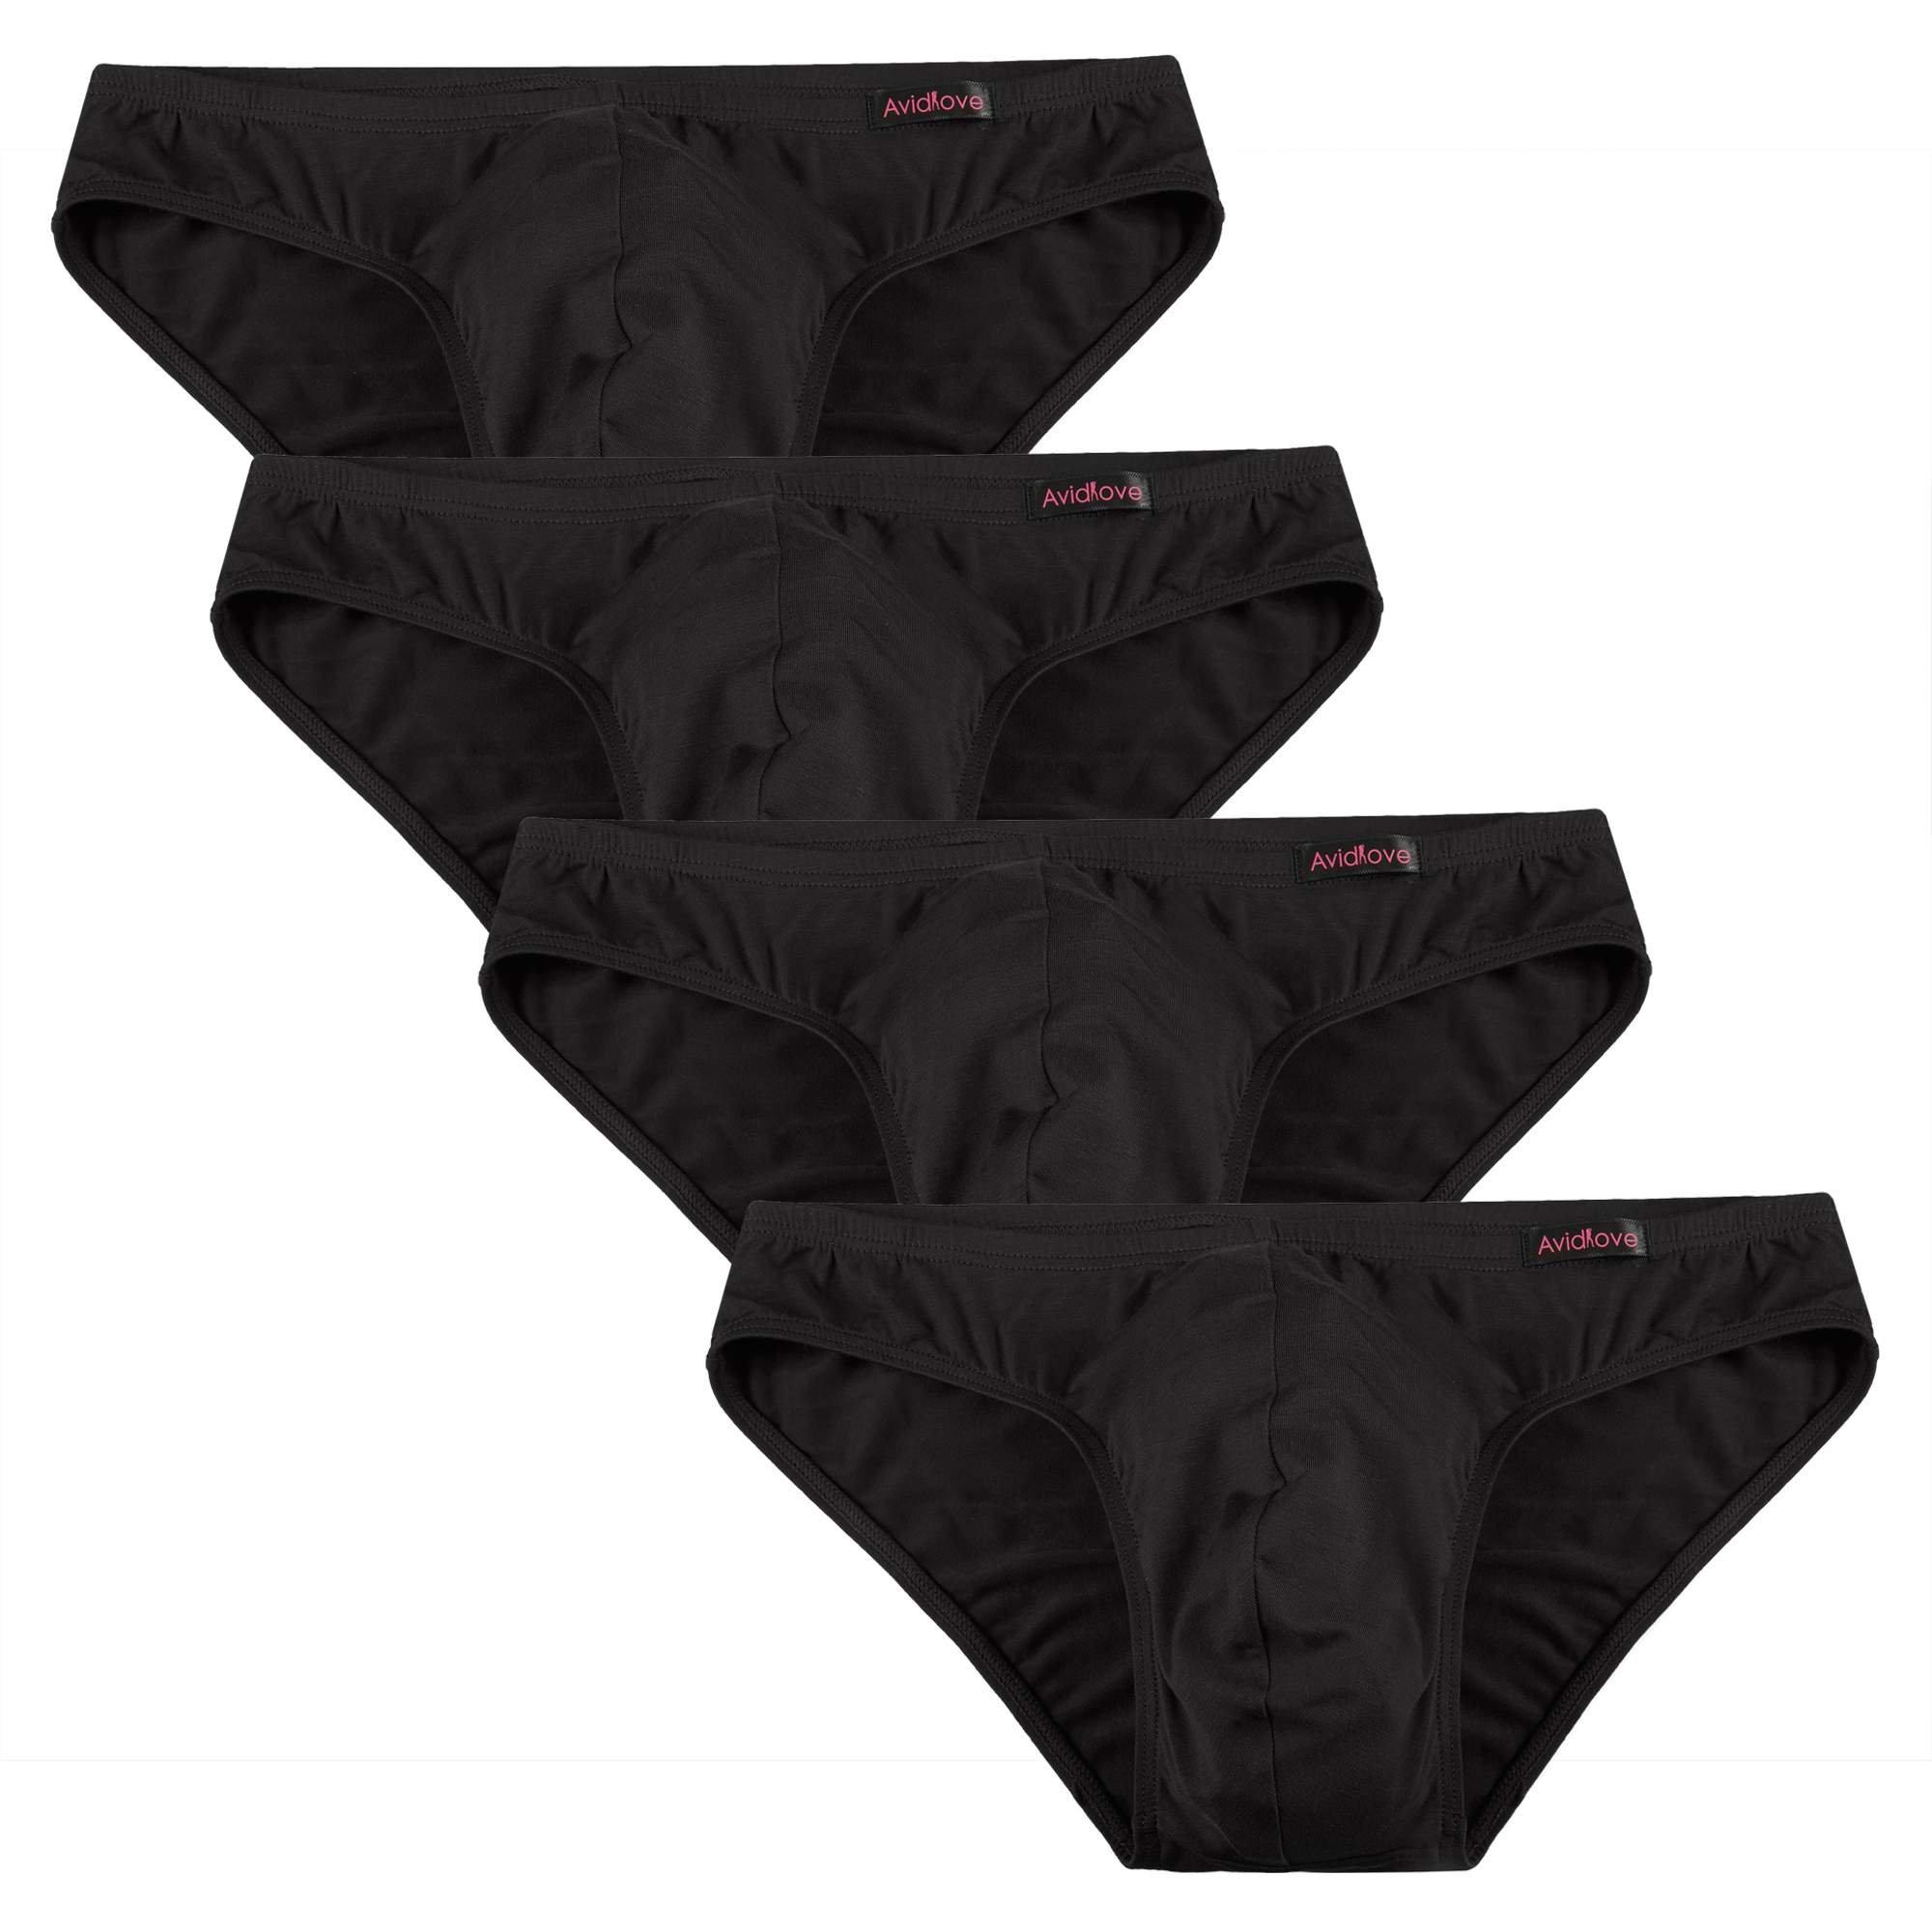 Avidlove Men Underwear Micromodal Bikinis 4 Pack Briefs Black  Medium